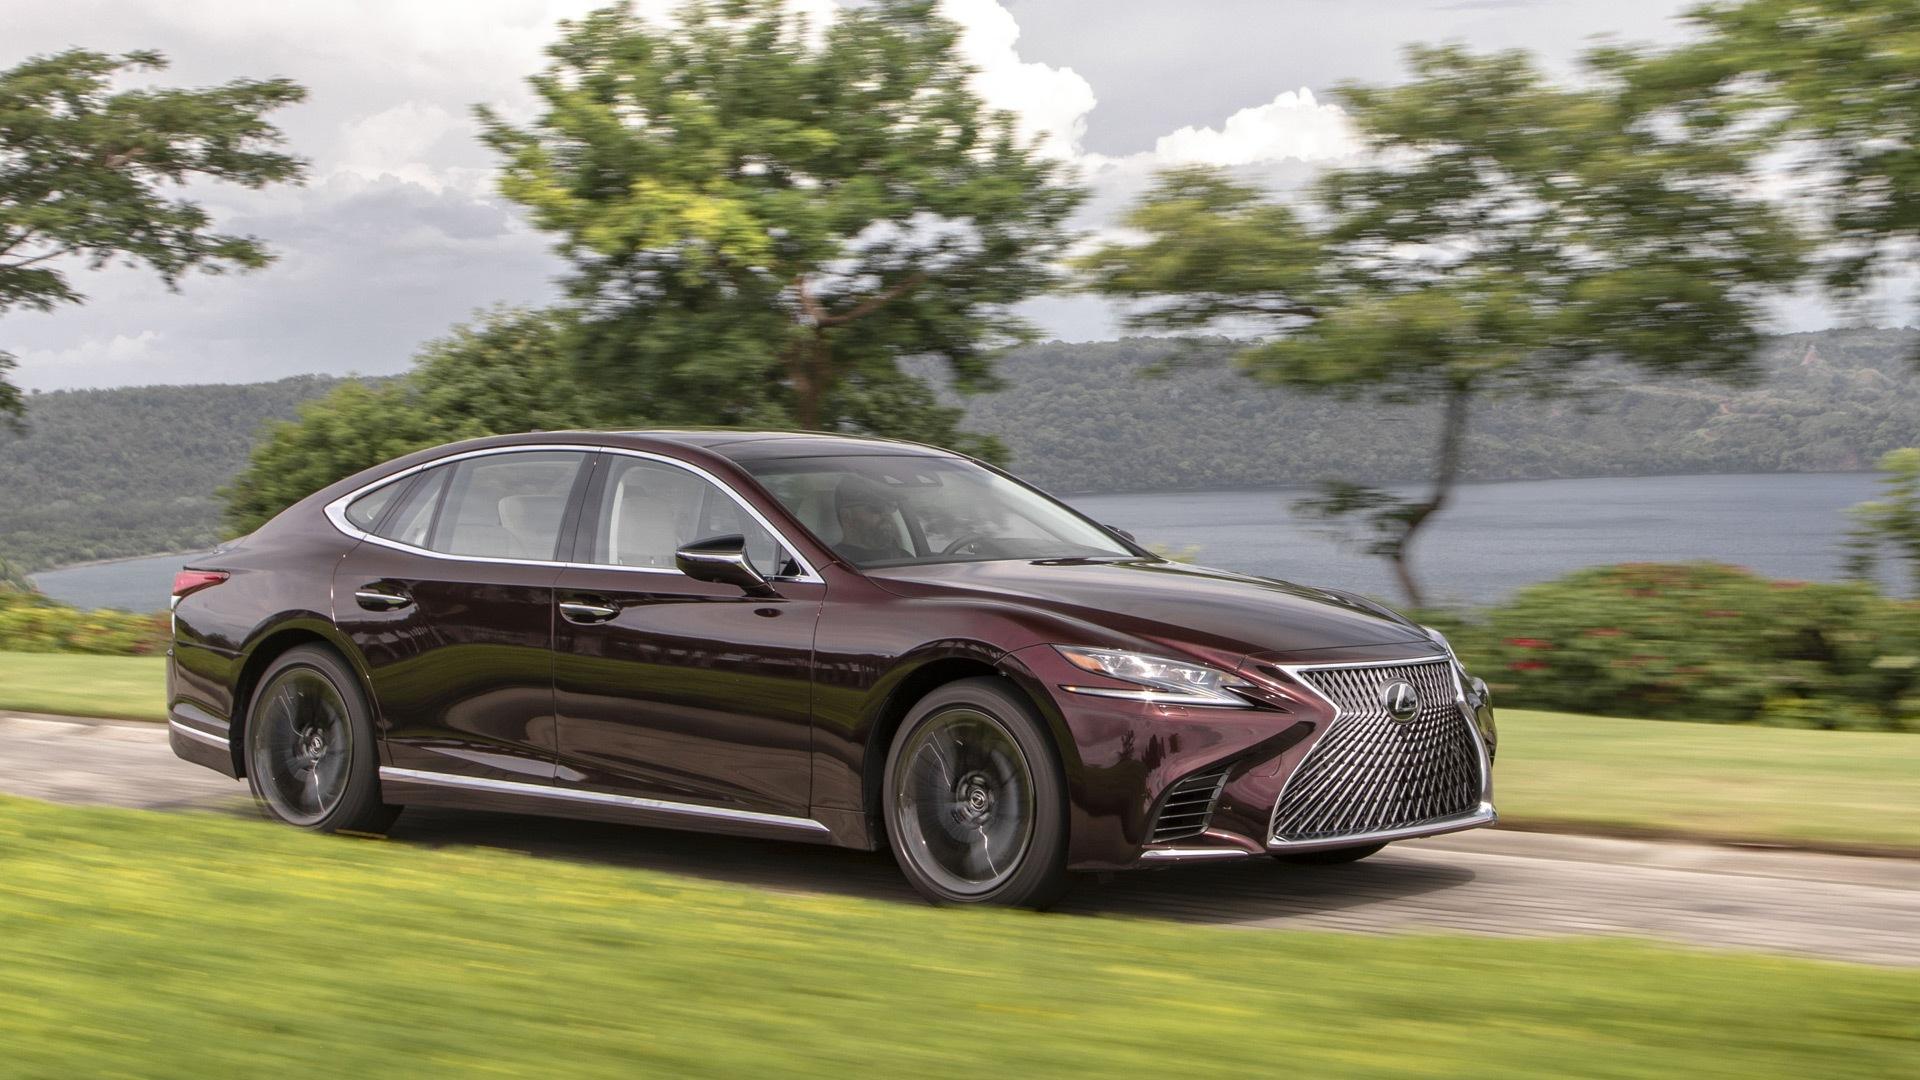 88 New Lexus Is 2020 Engine by Lexus Is 2020